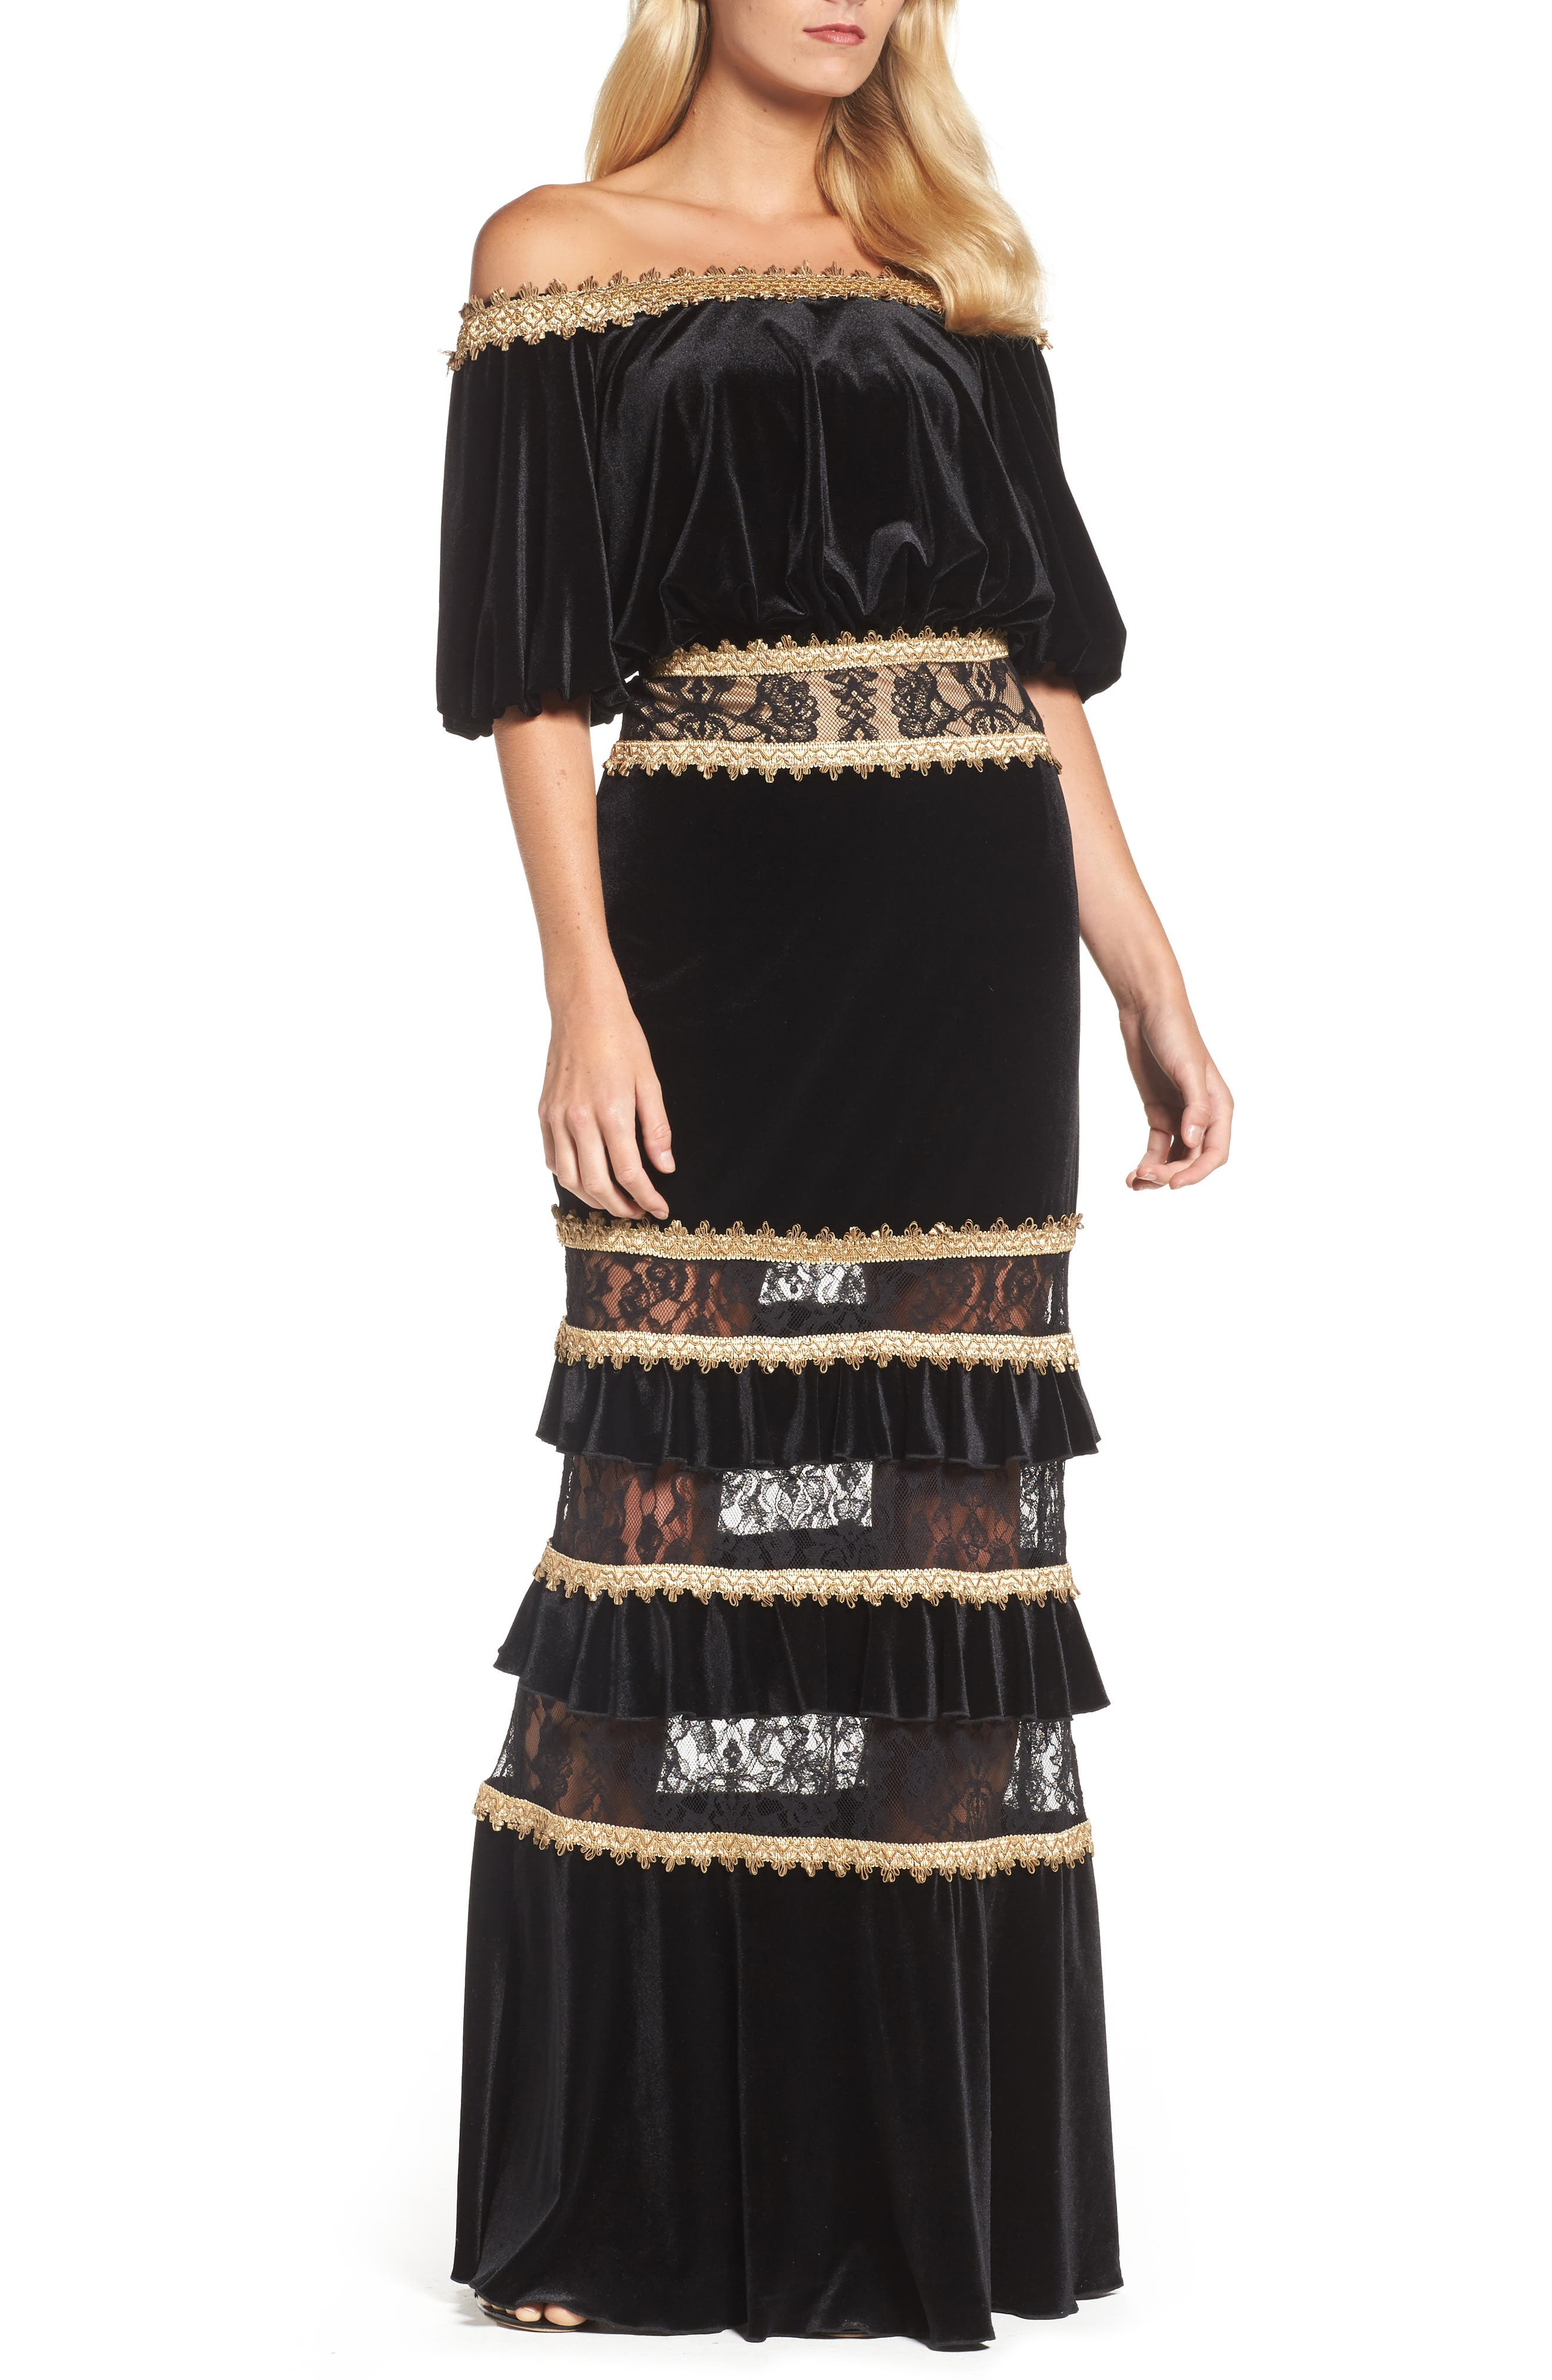 Tadashi Shoji Velvet Ruffle & Lace Off the Shoulder Gown